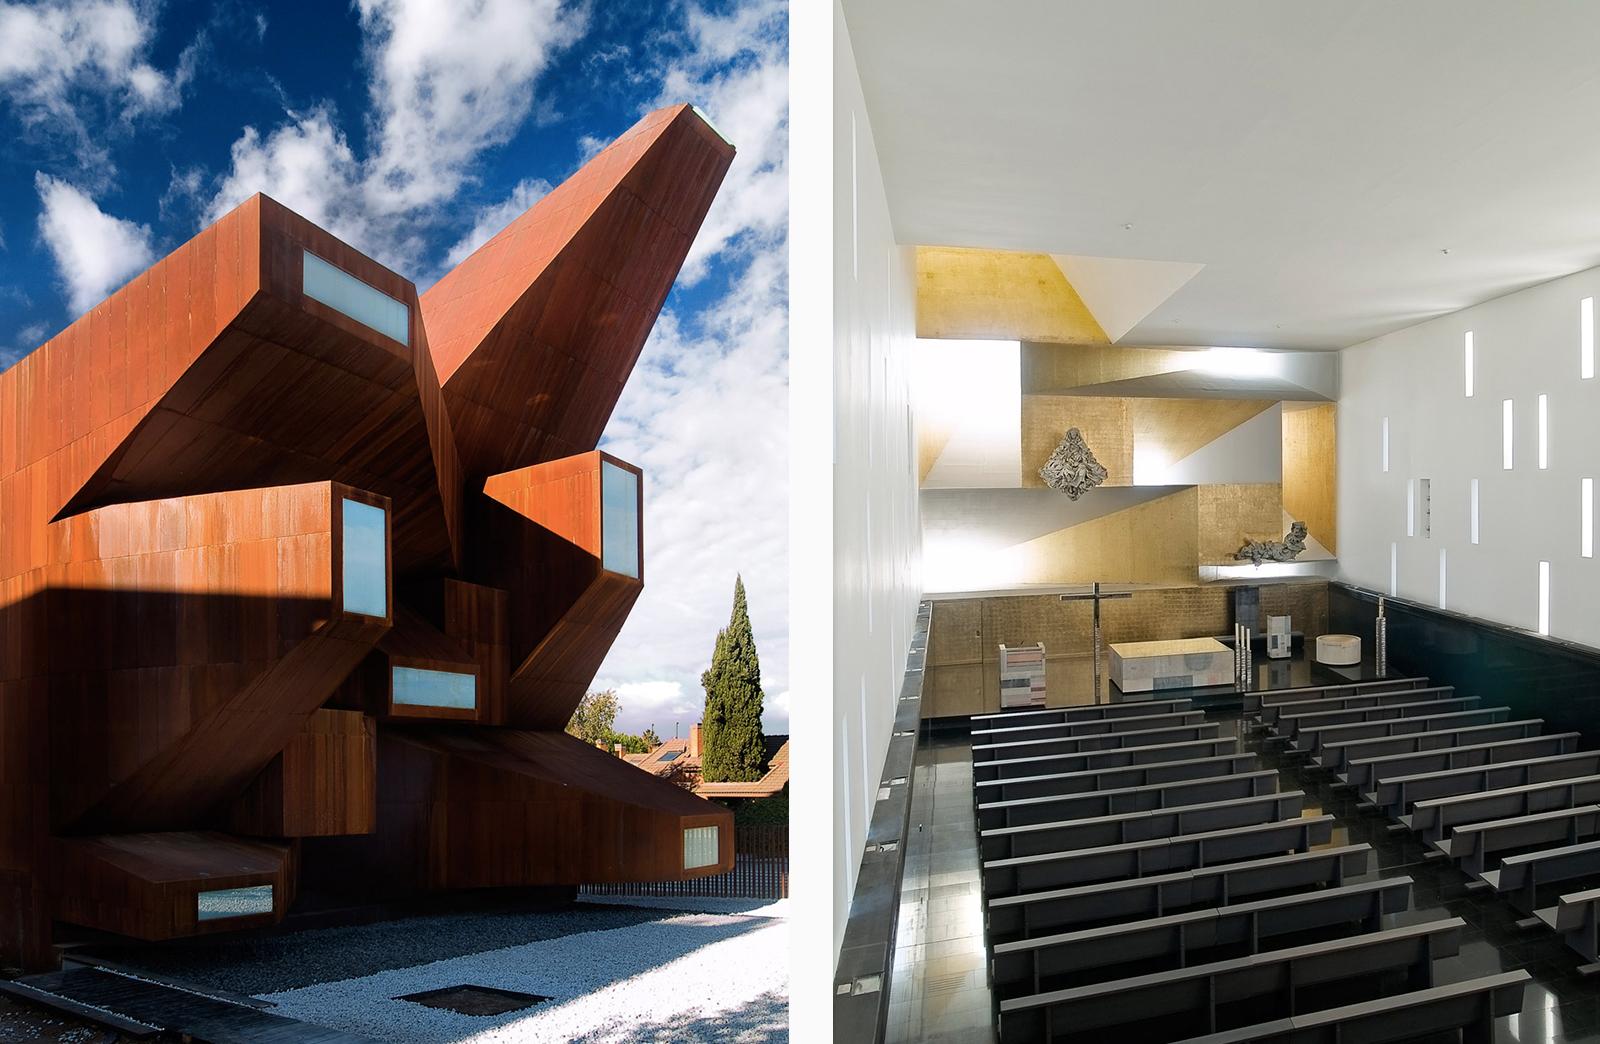 Church of Santa Monica, by Vicens + Ramos, Madrid, Spain